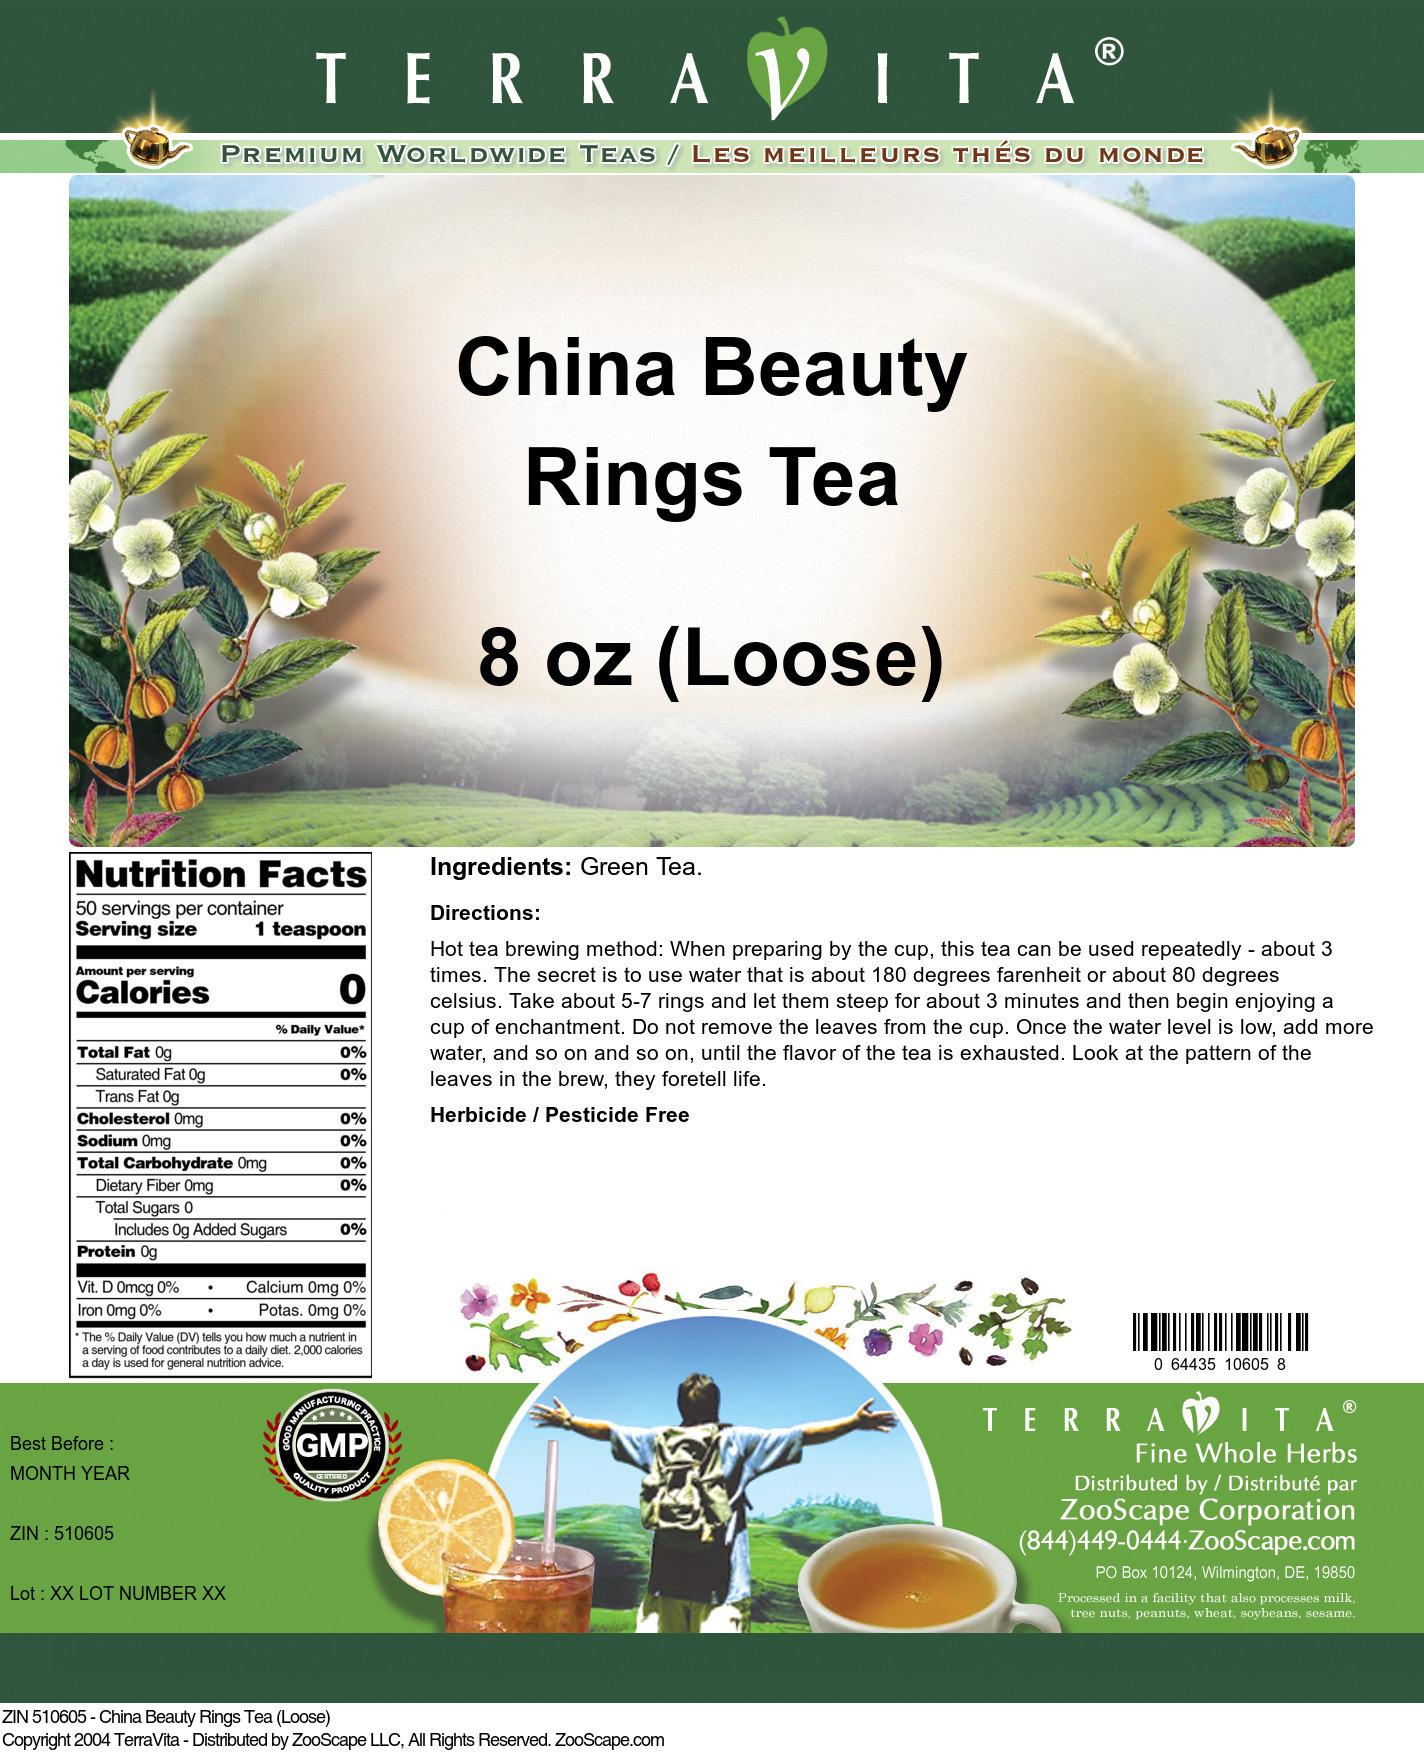 China Beauty Rings Tea (Loose)